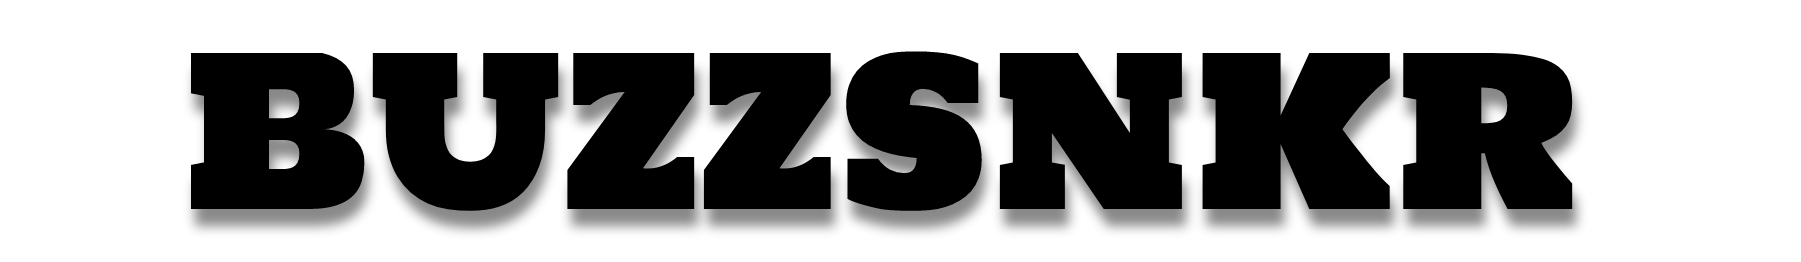 BUZZSNKR